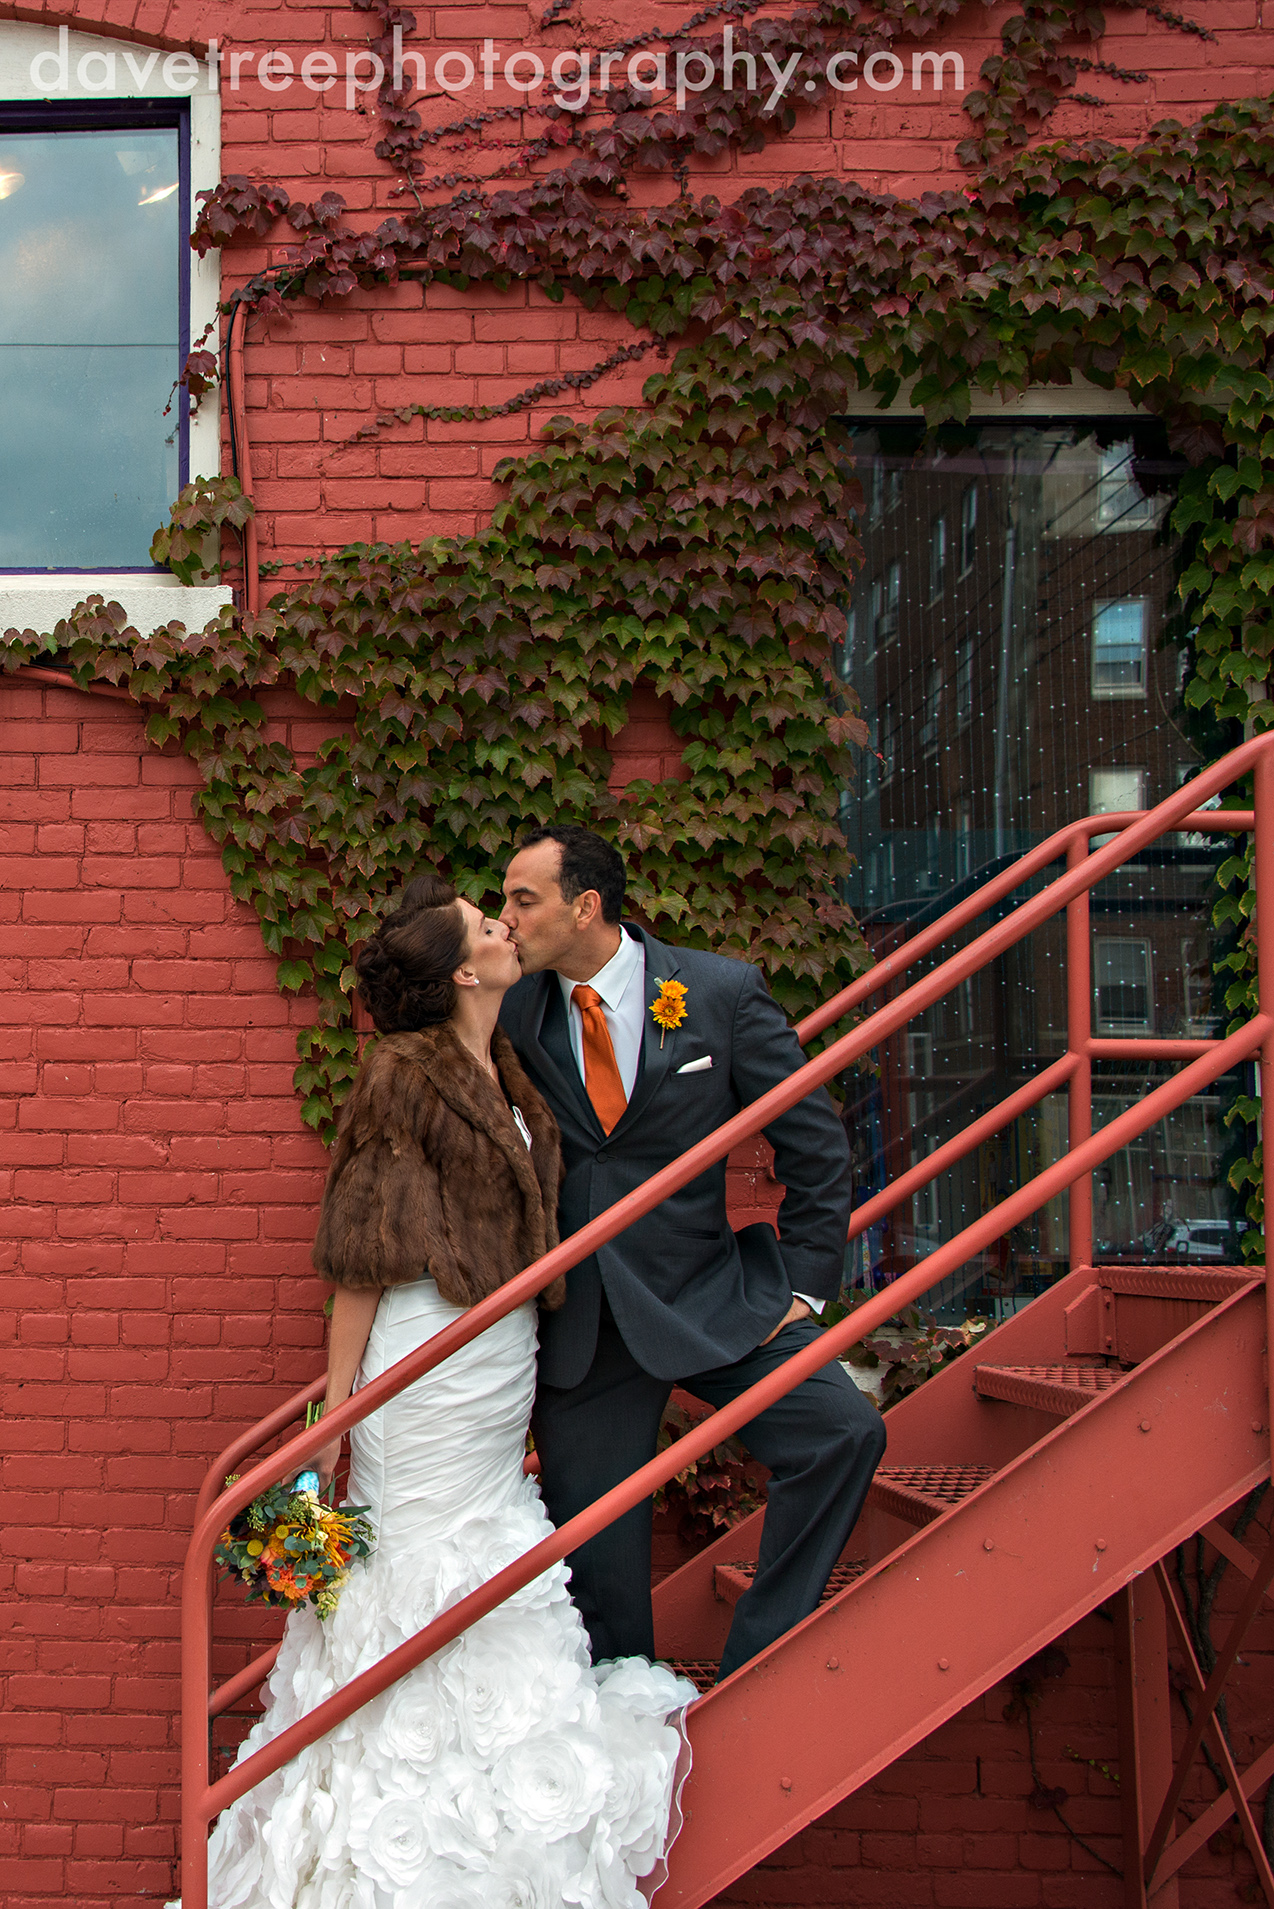 st_joseph_wedding_photographers_destination_ wedding_photographers_veranda_at_the_whitcomb_wedding18